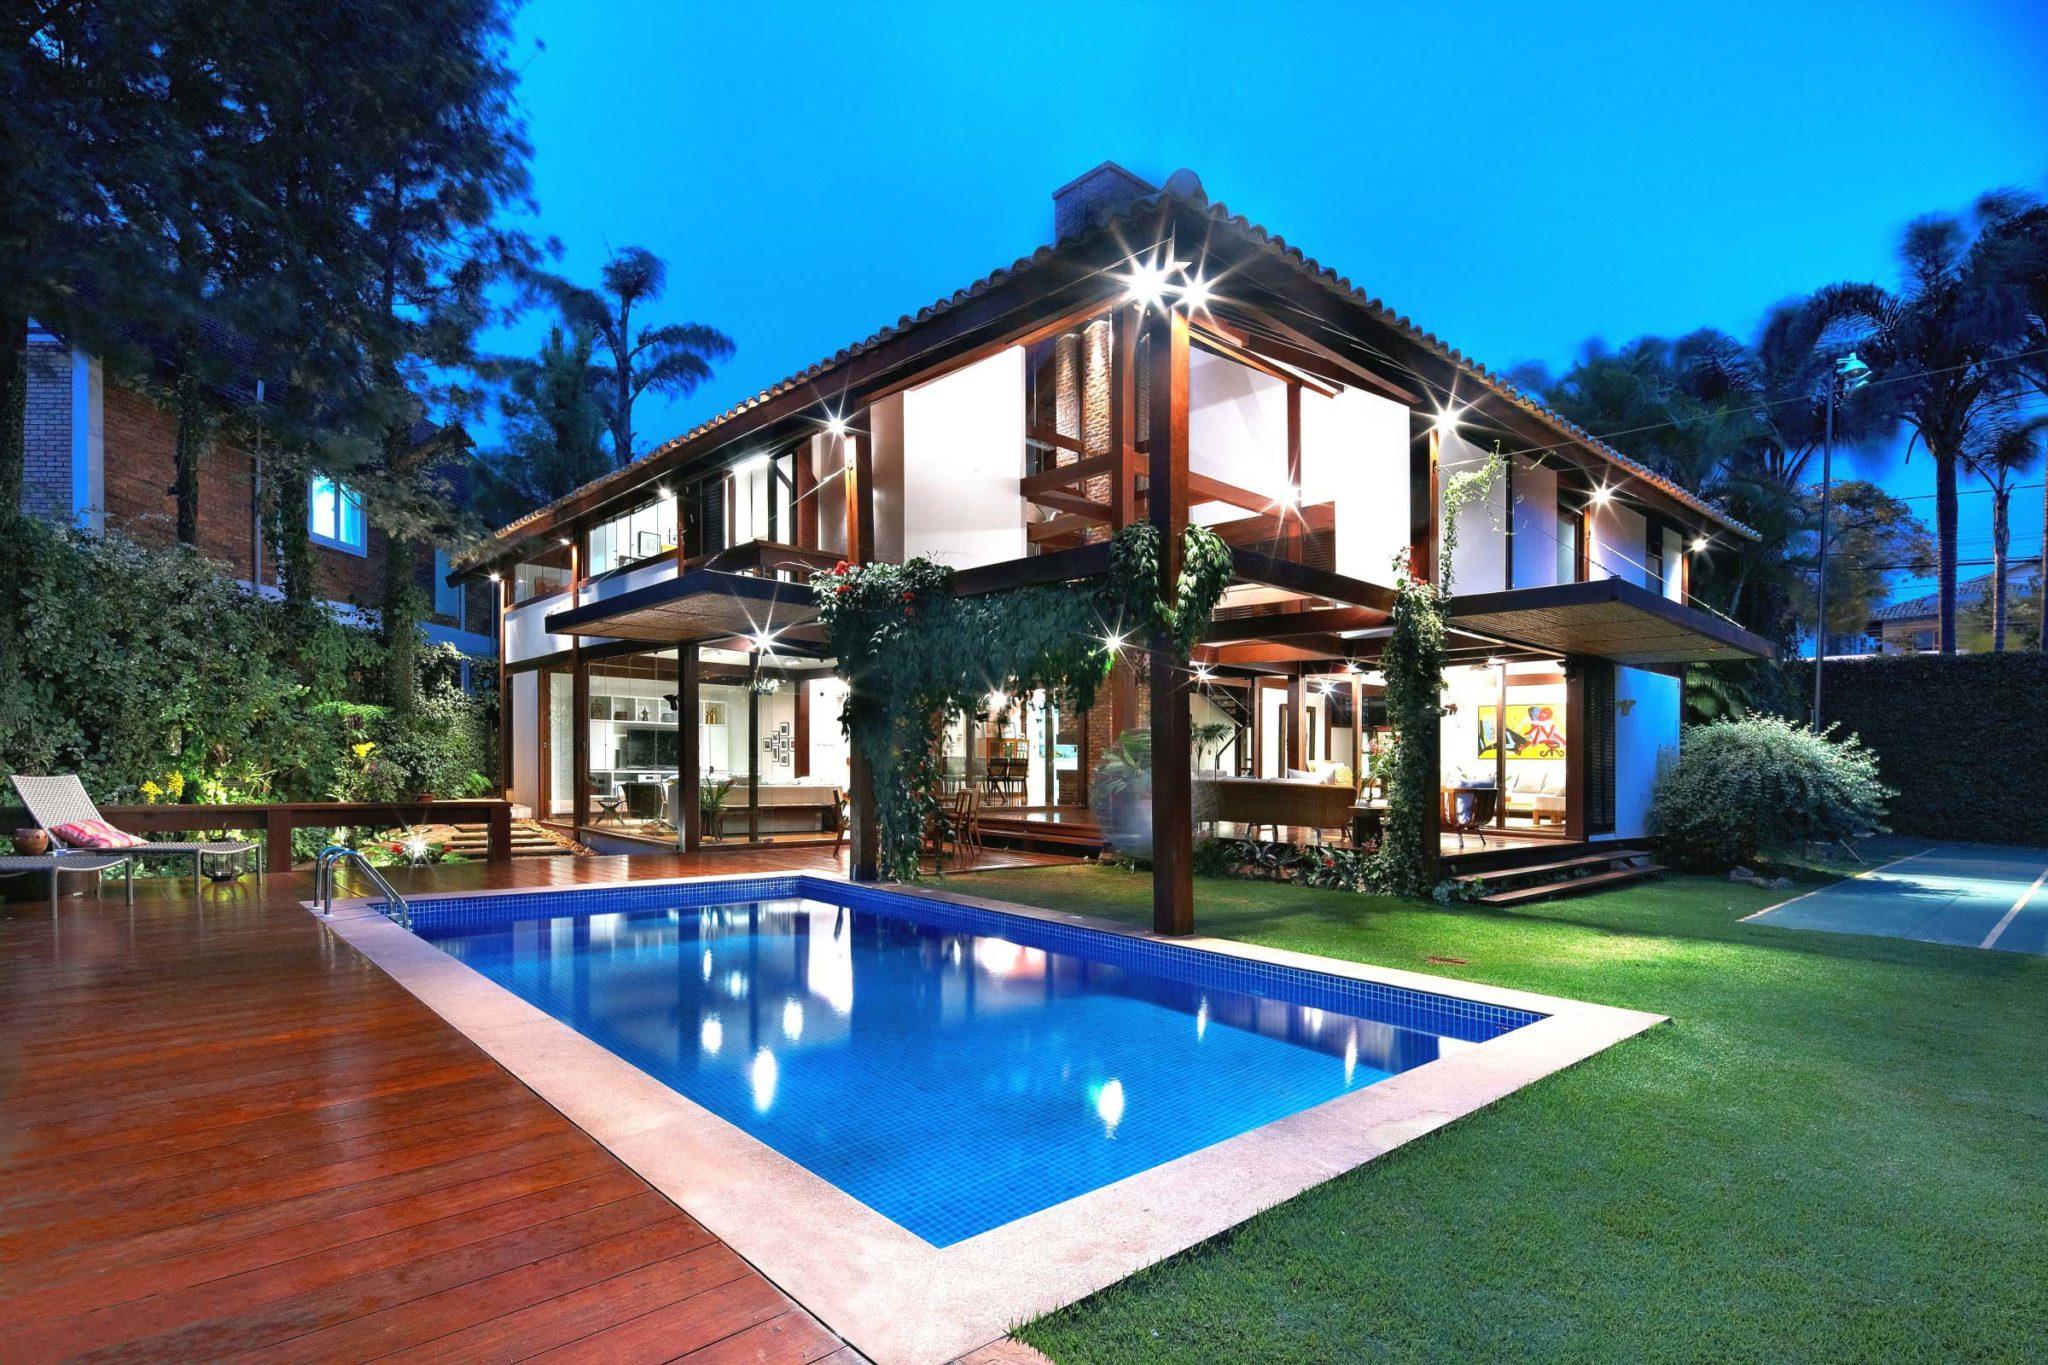 Facciata-esterna-villa-moderna-piscina-parquet-architettura-design